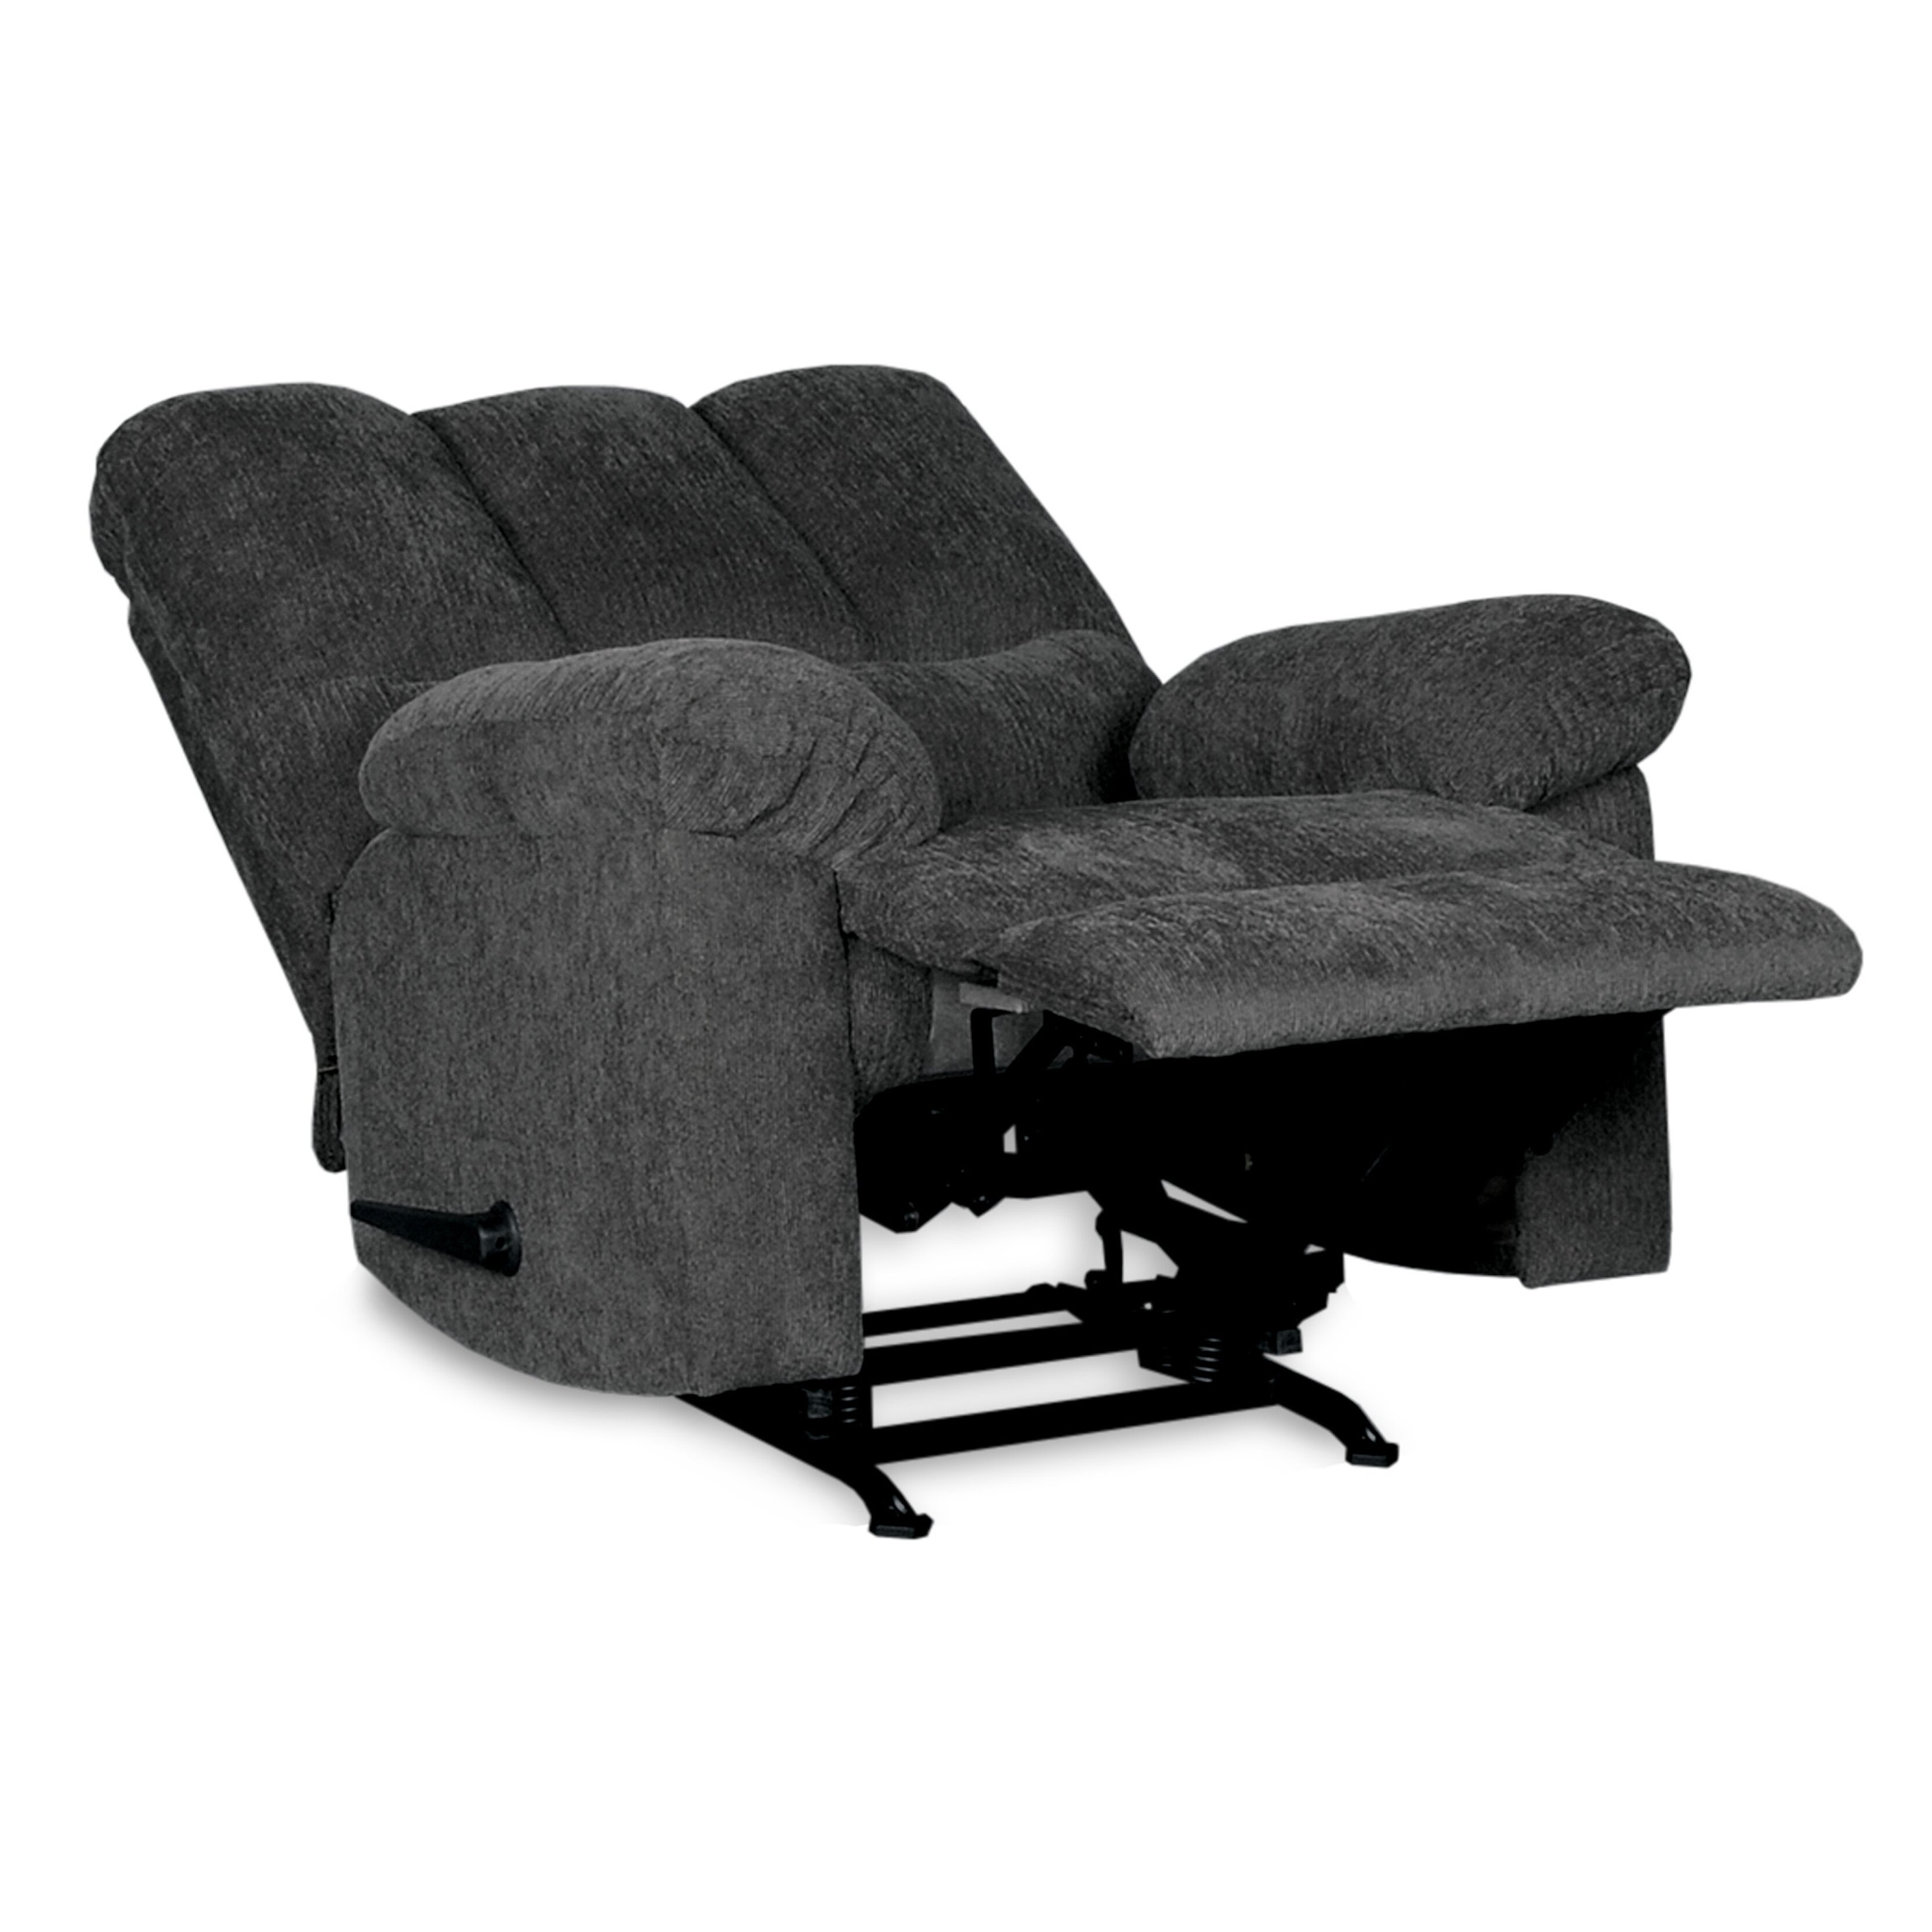 Revoluxion Furniture Co Ethan Recliner Wayfair